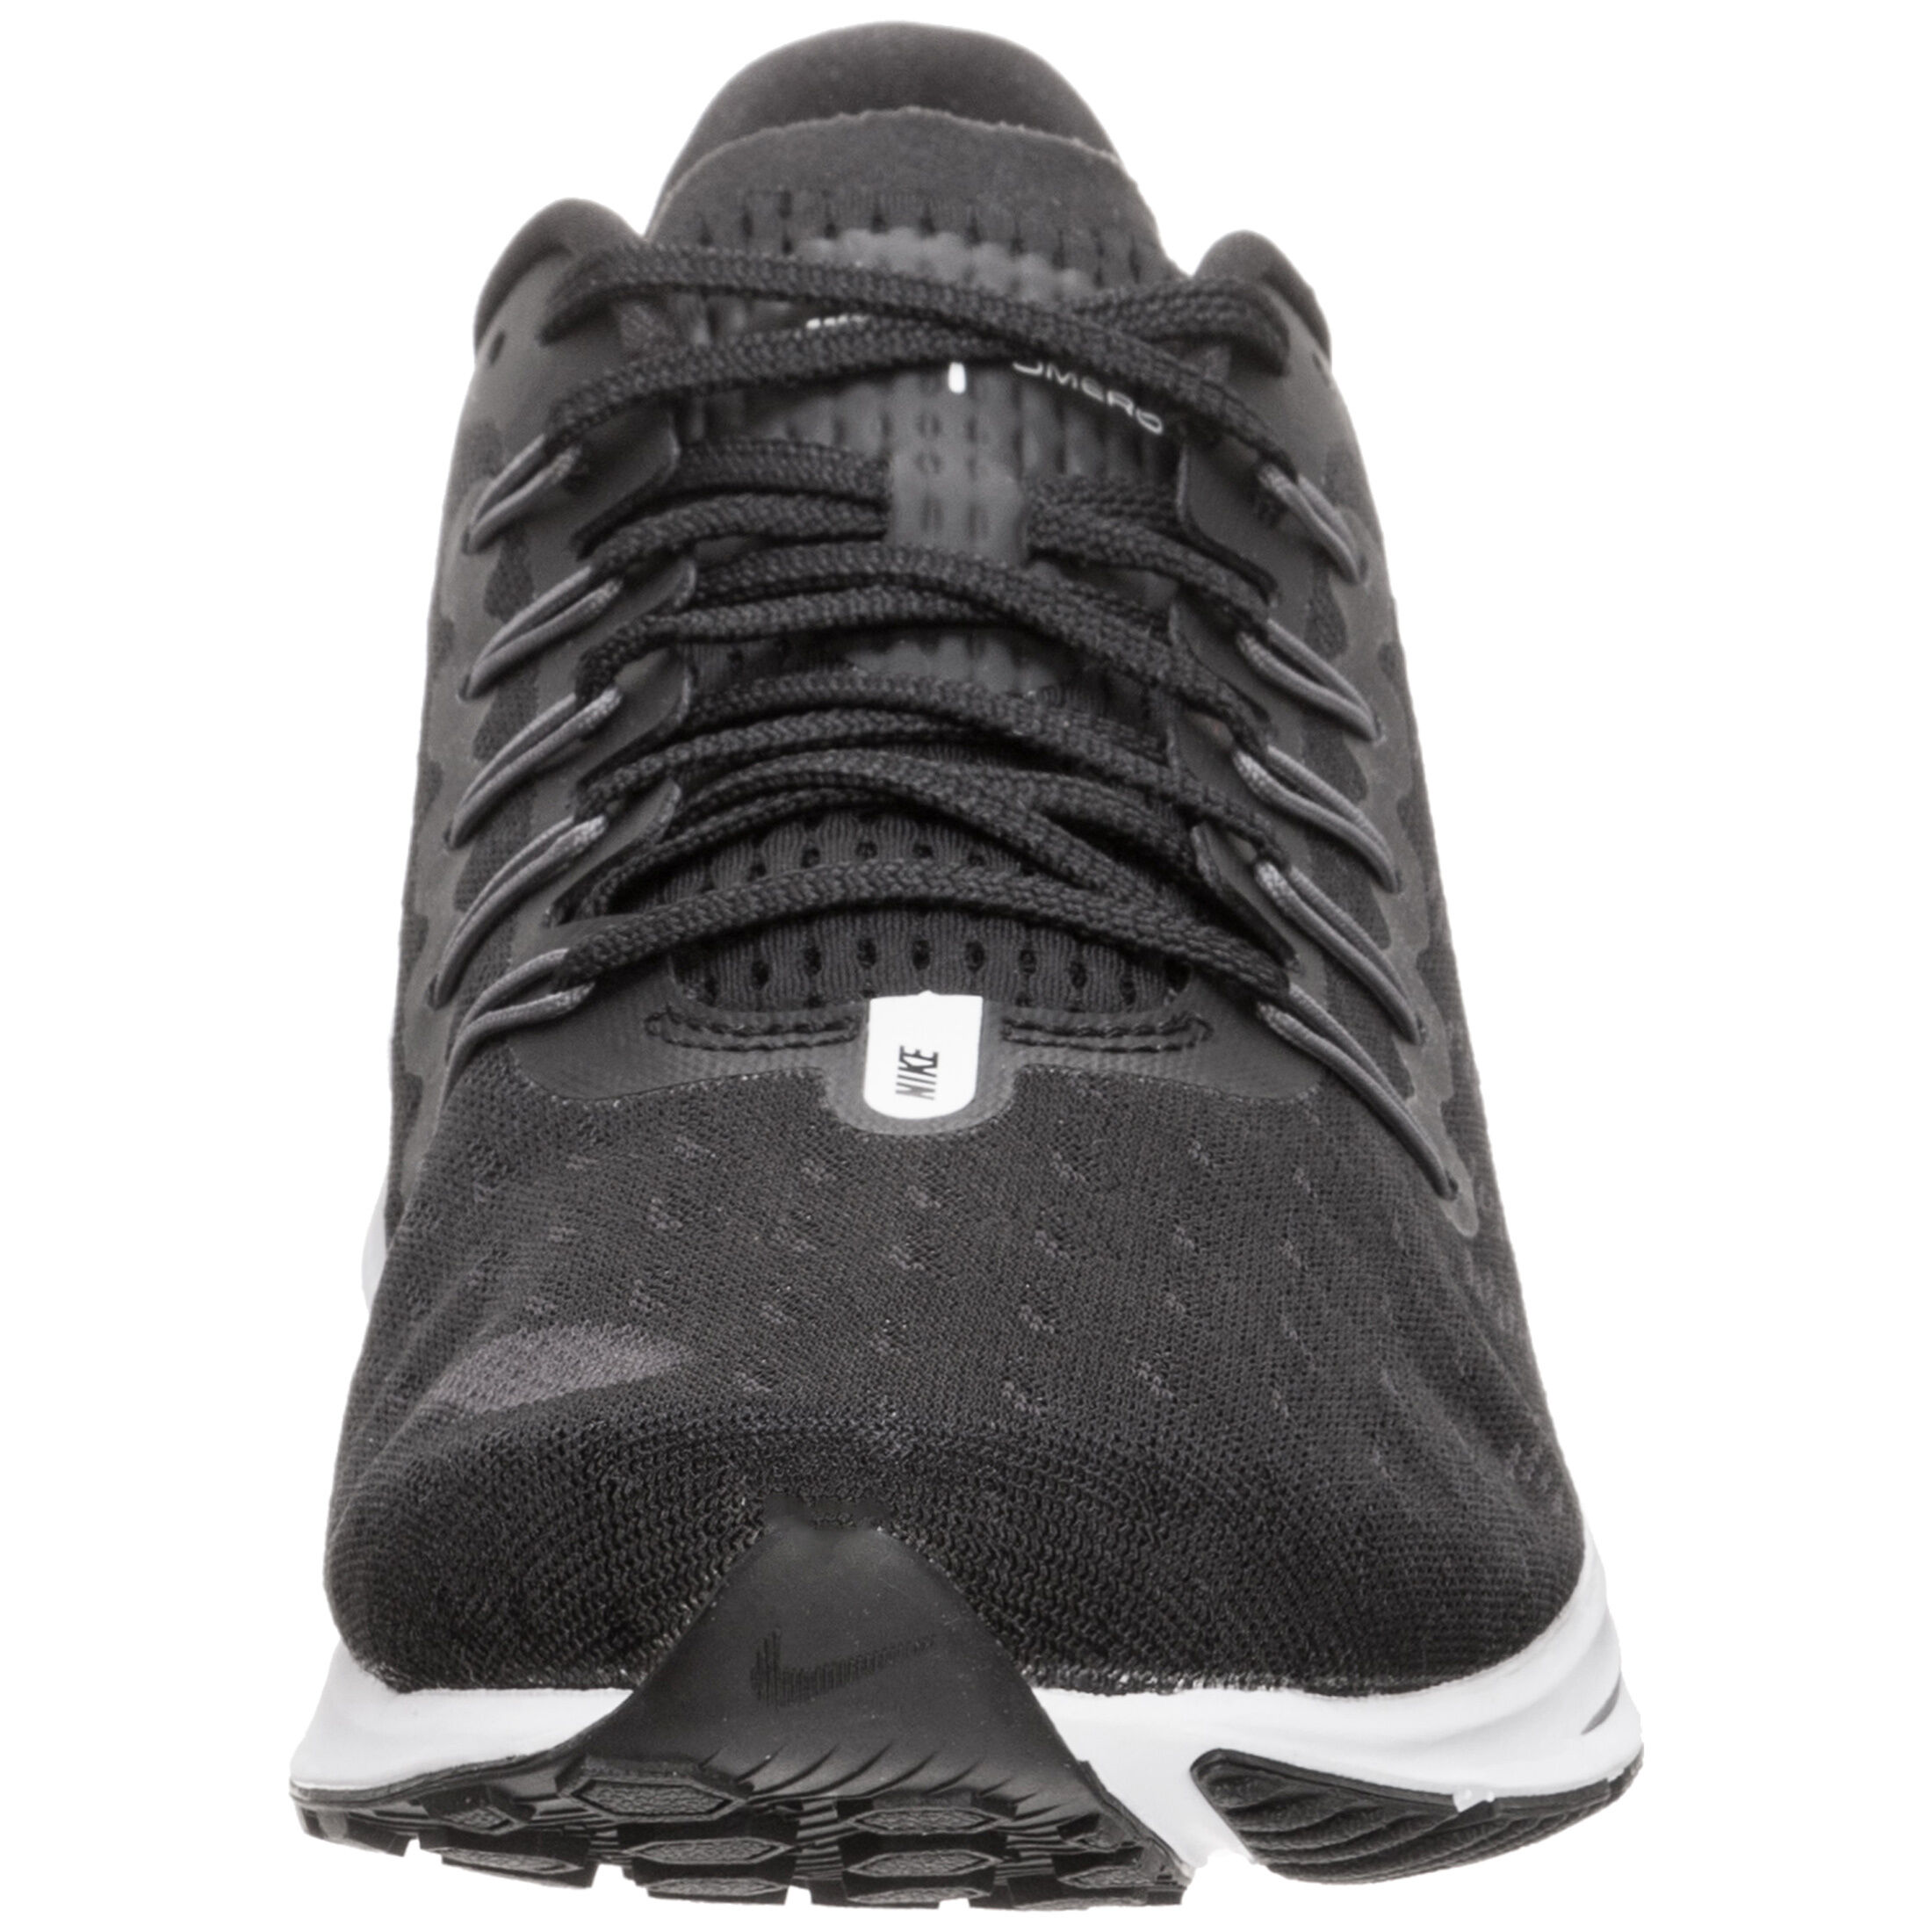 Nike Herren Laufschuhe Air Zoom Vomero 14 |